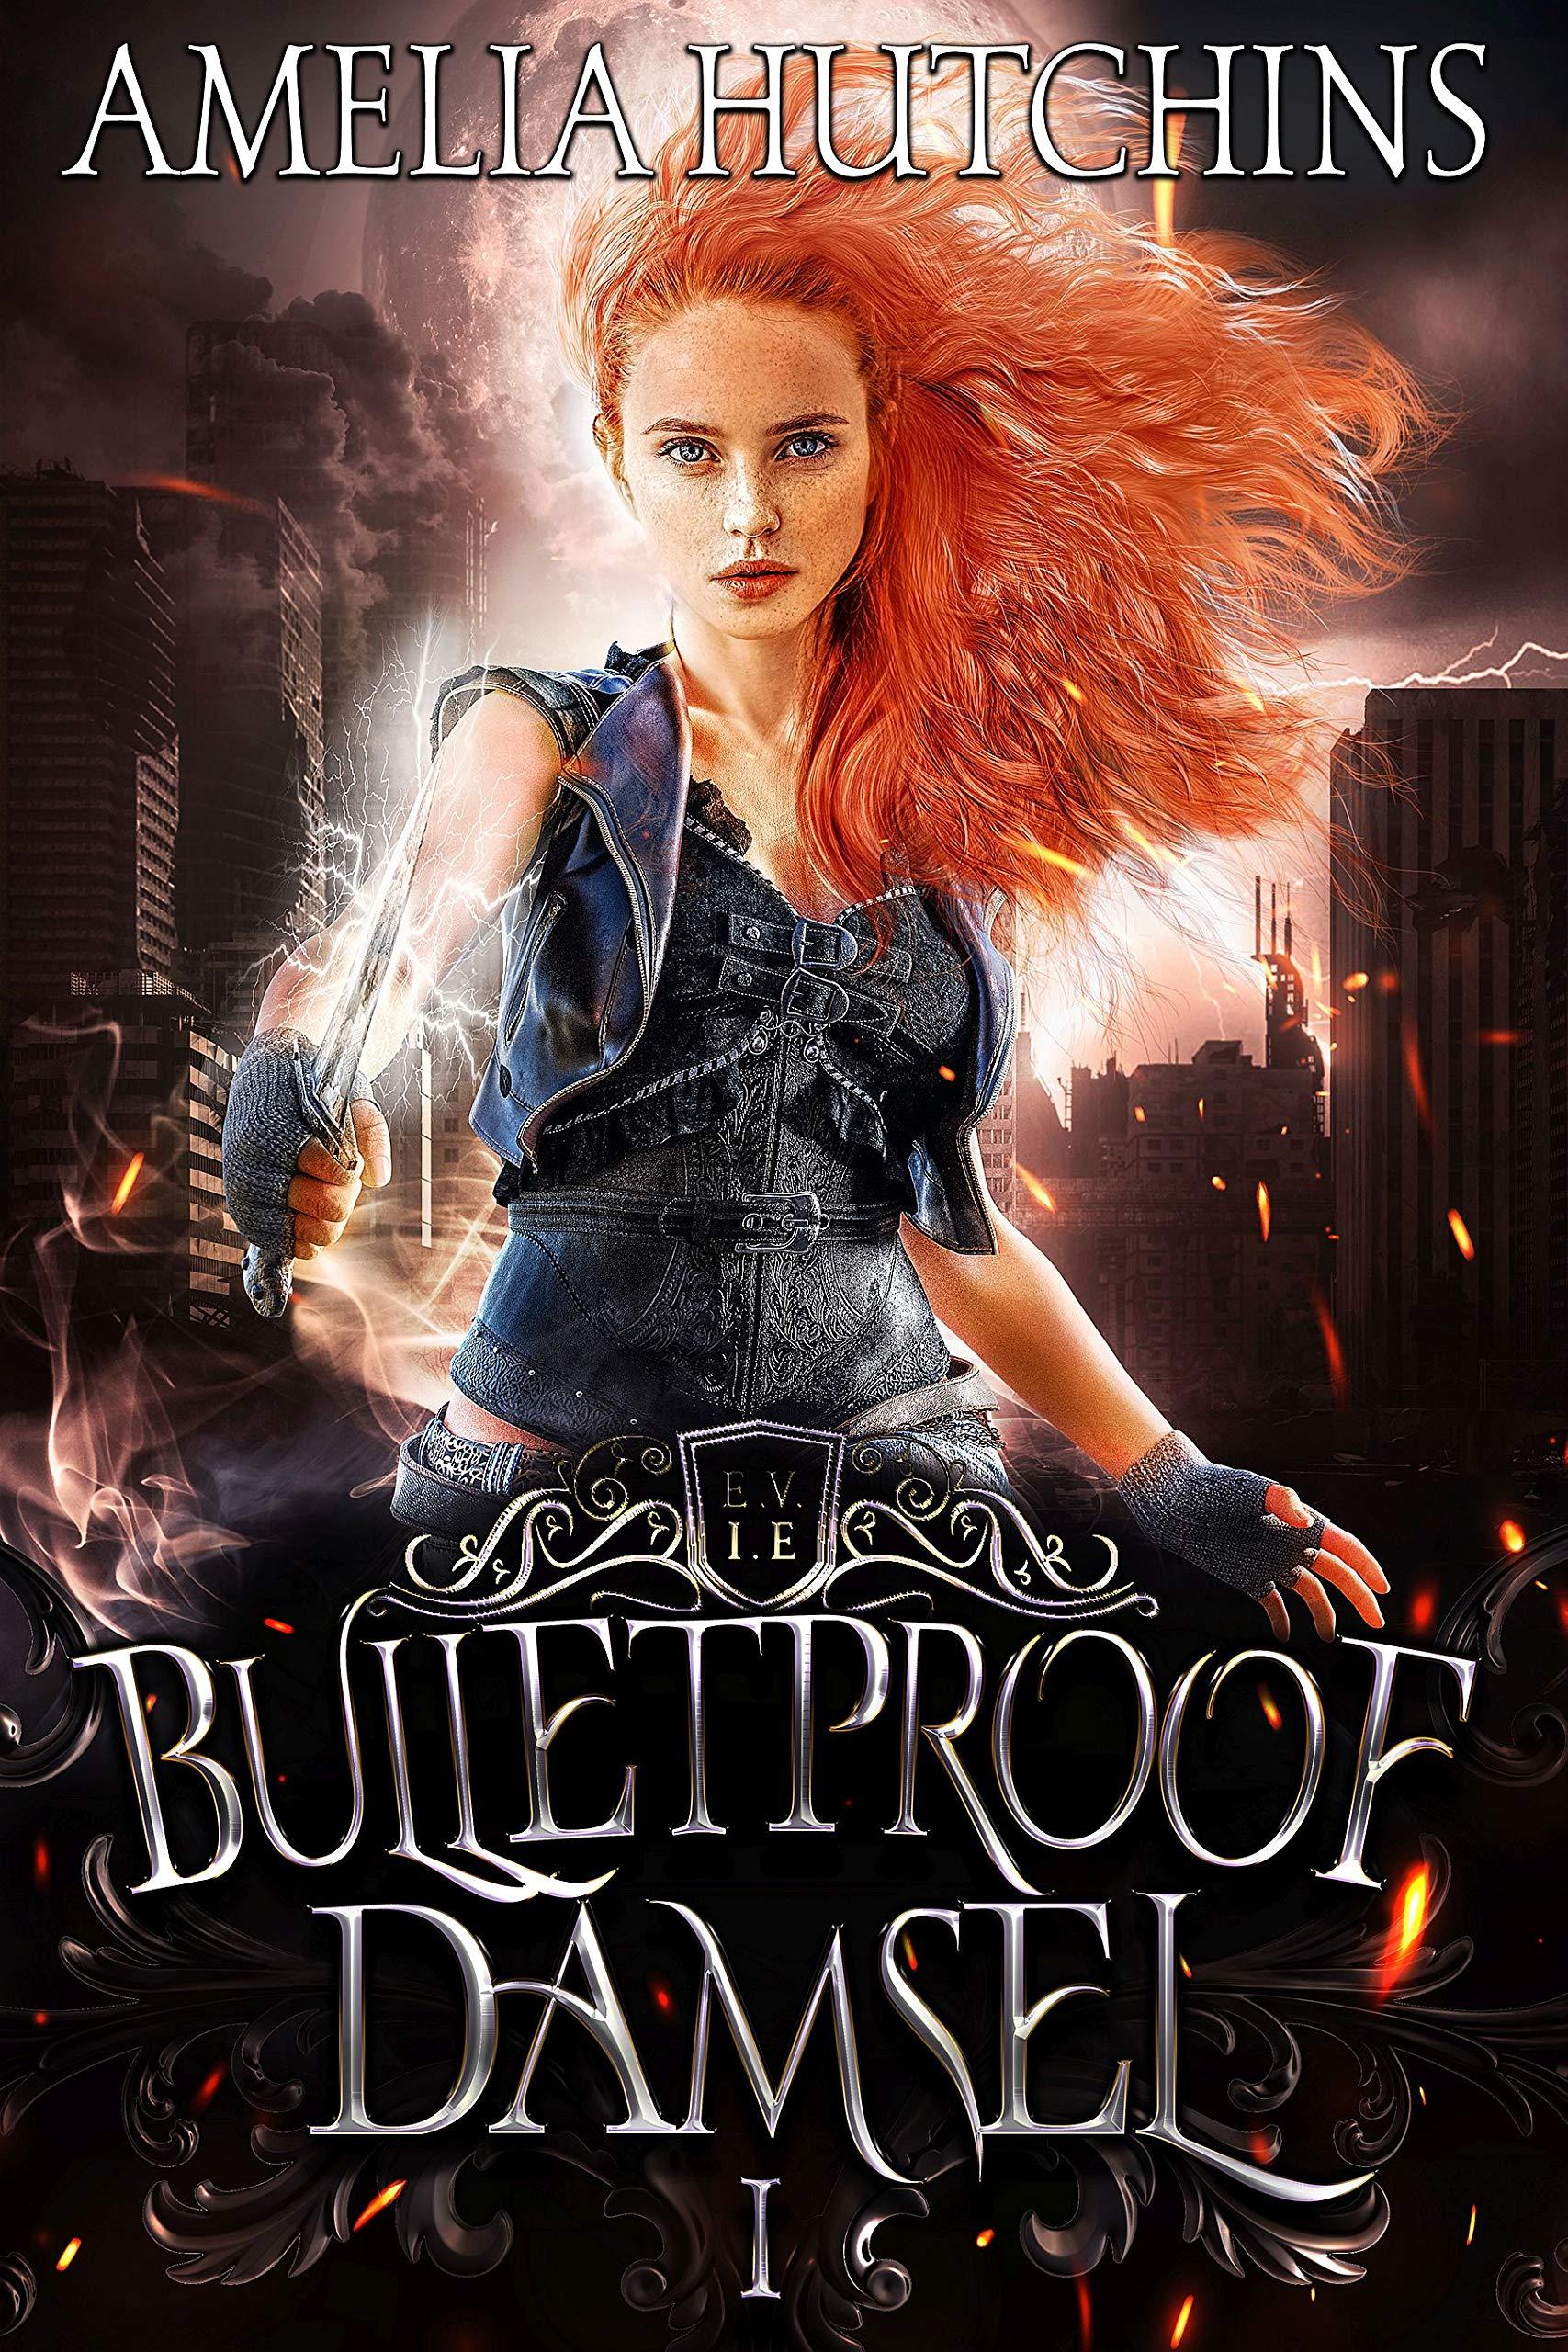 Bulletproof Damsel (Urban Fantasy Romance Series Book, #1)